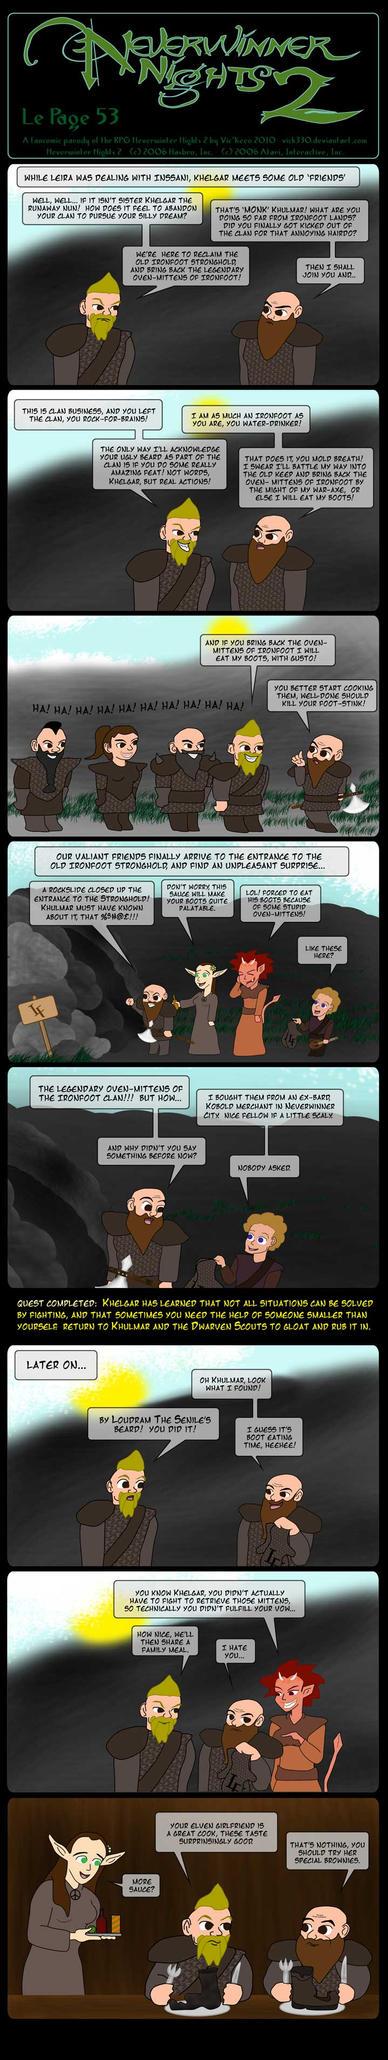 Neverwinner Nights2 pg 53 by vick330